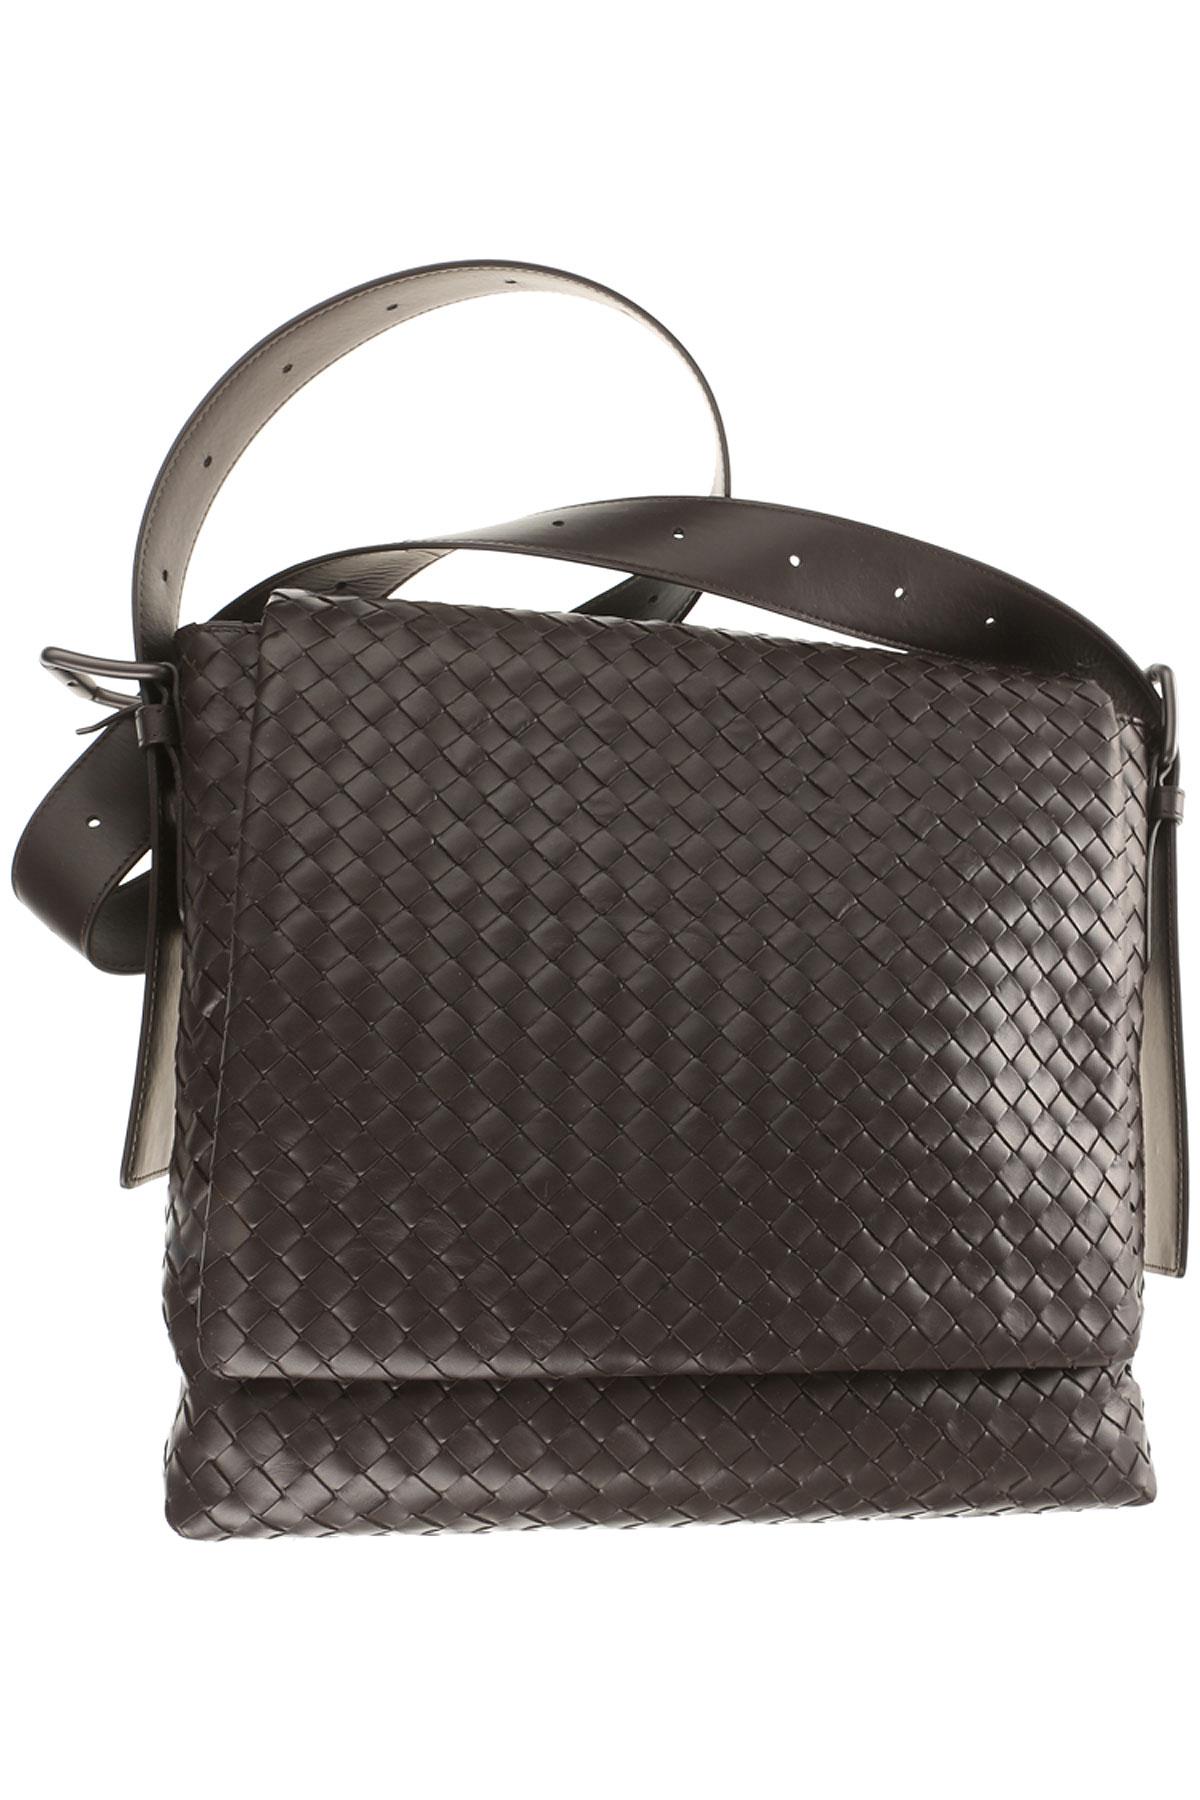 Bottega Veneta Briefcases, Chocolate Brown, Leather, 2019